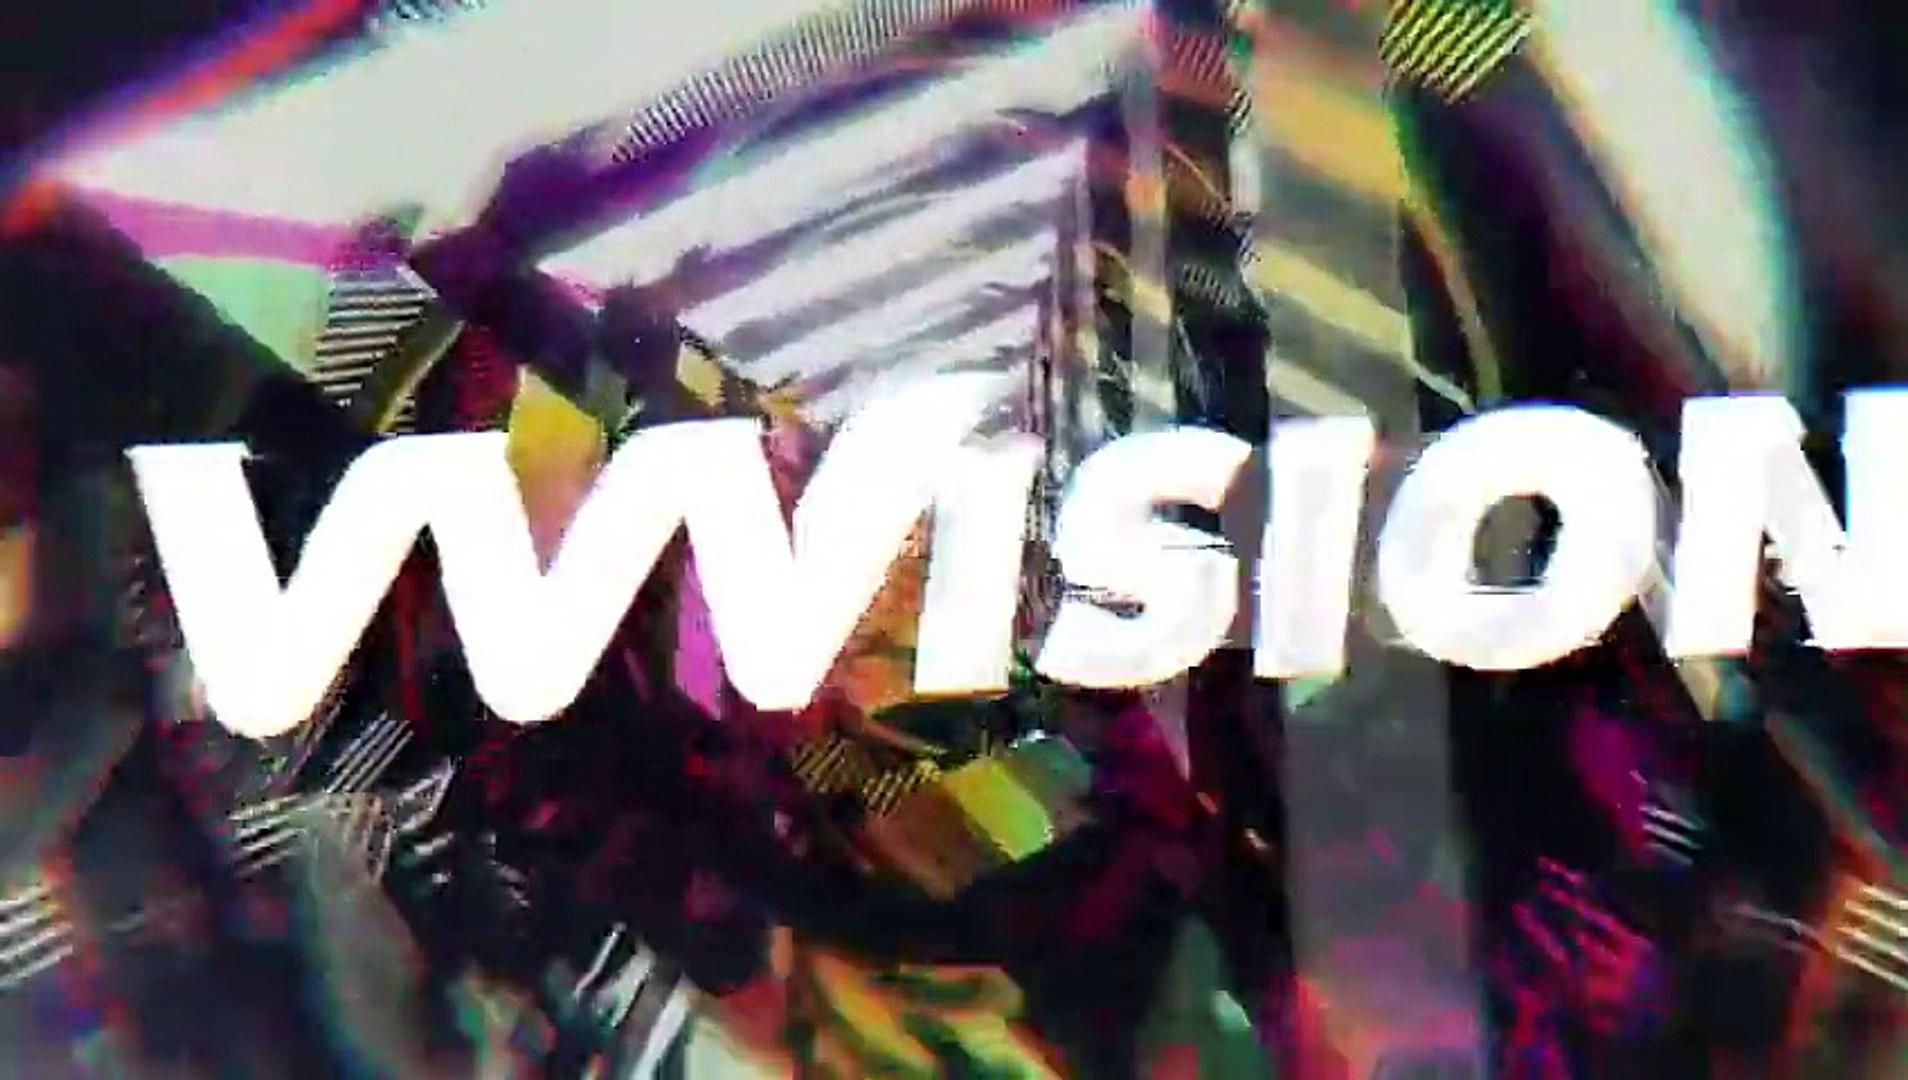 VVVision - Annie Eve (  Amy Winehouse, Katy B, Bob Dylan, Cat Power)